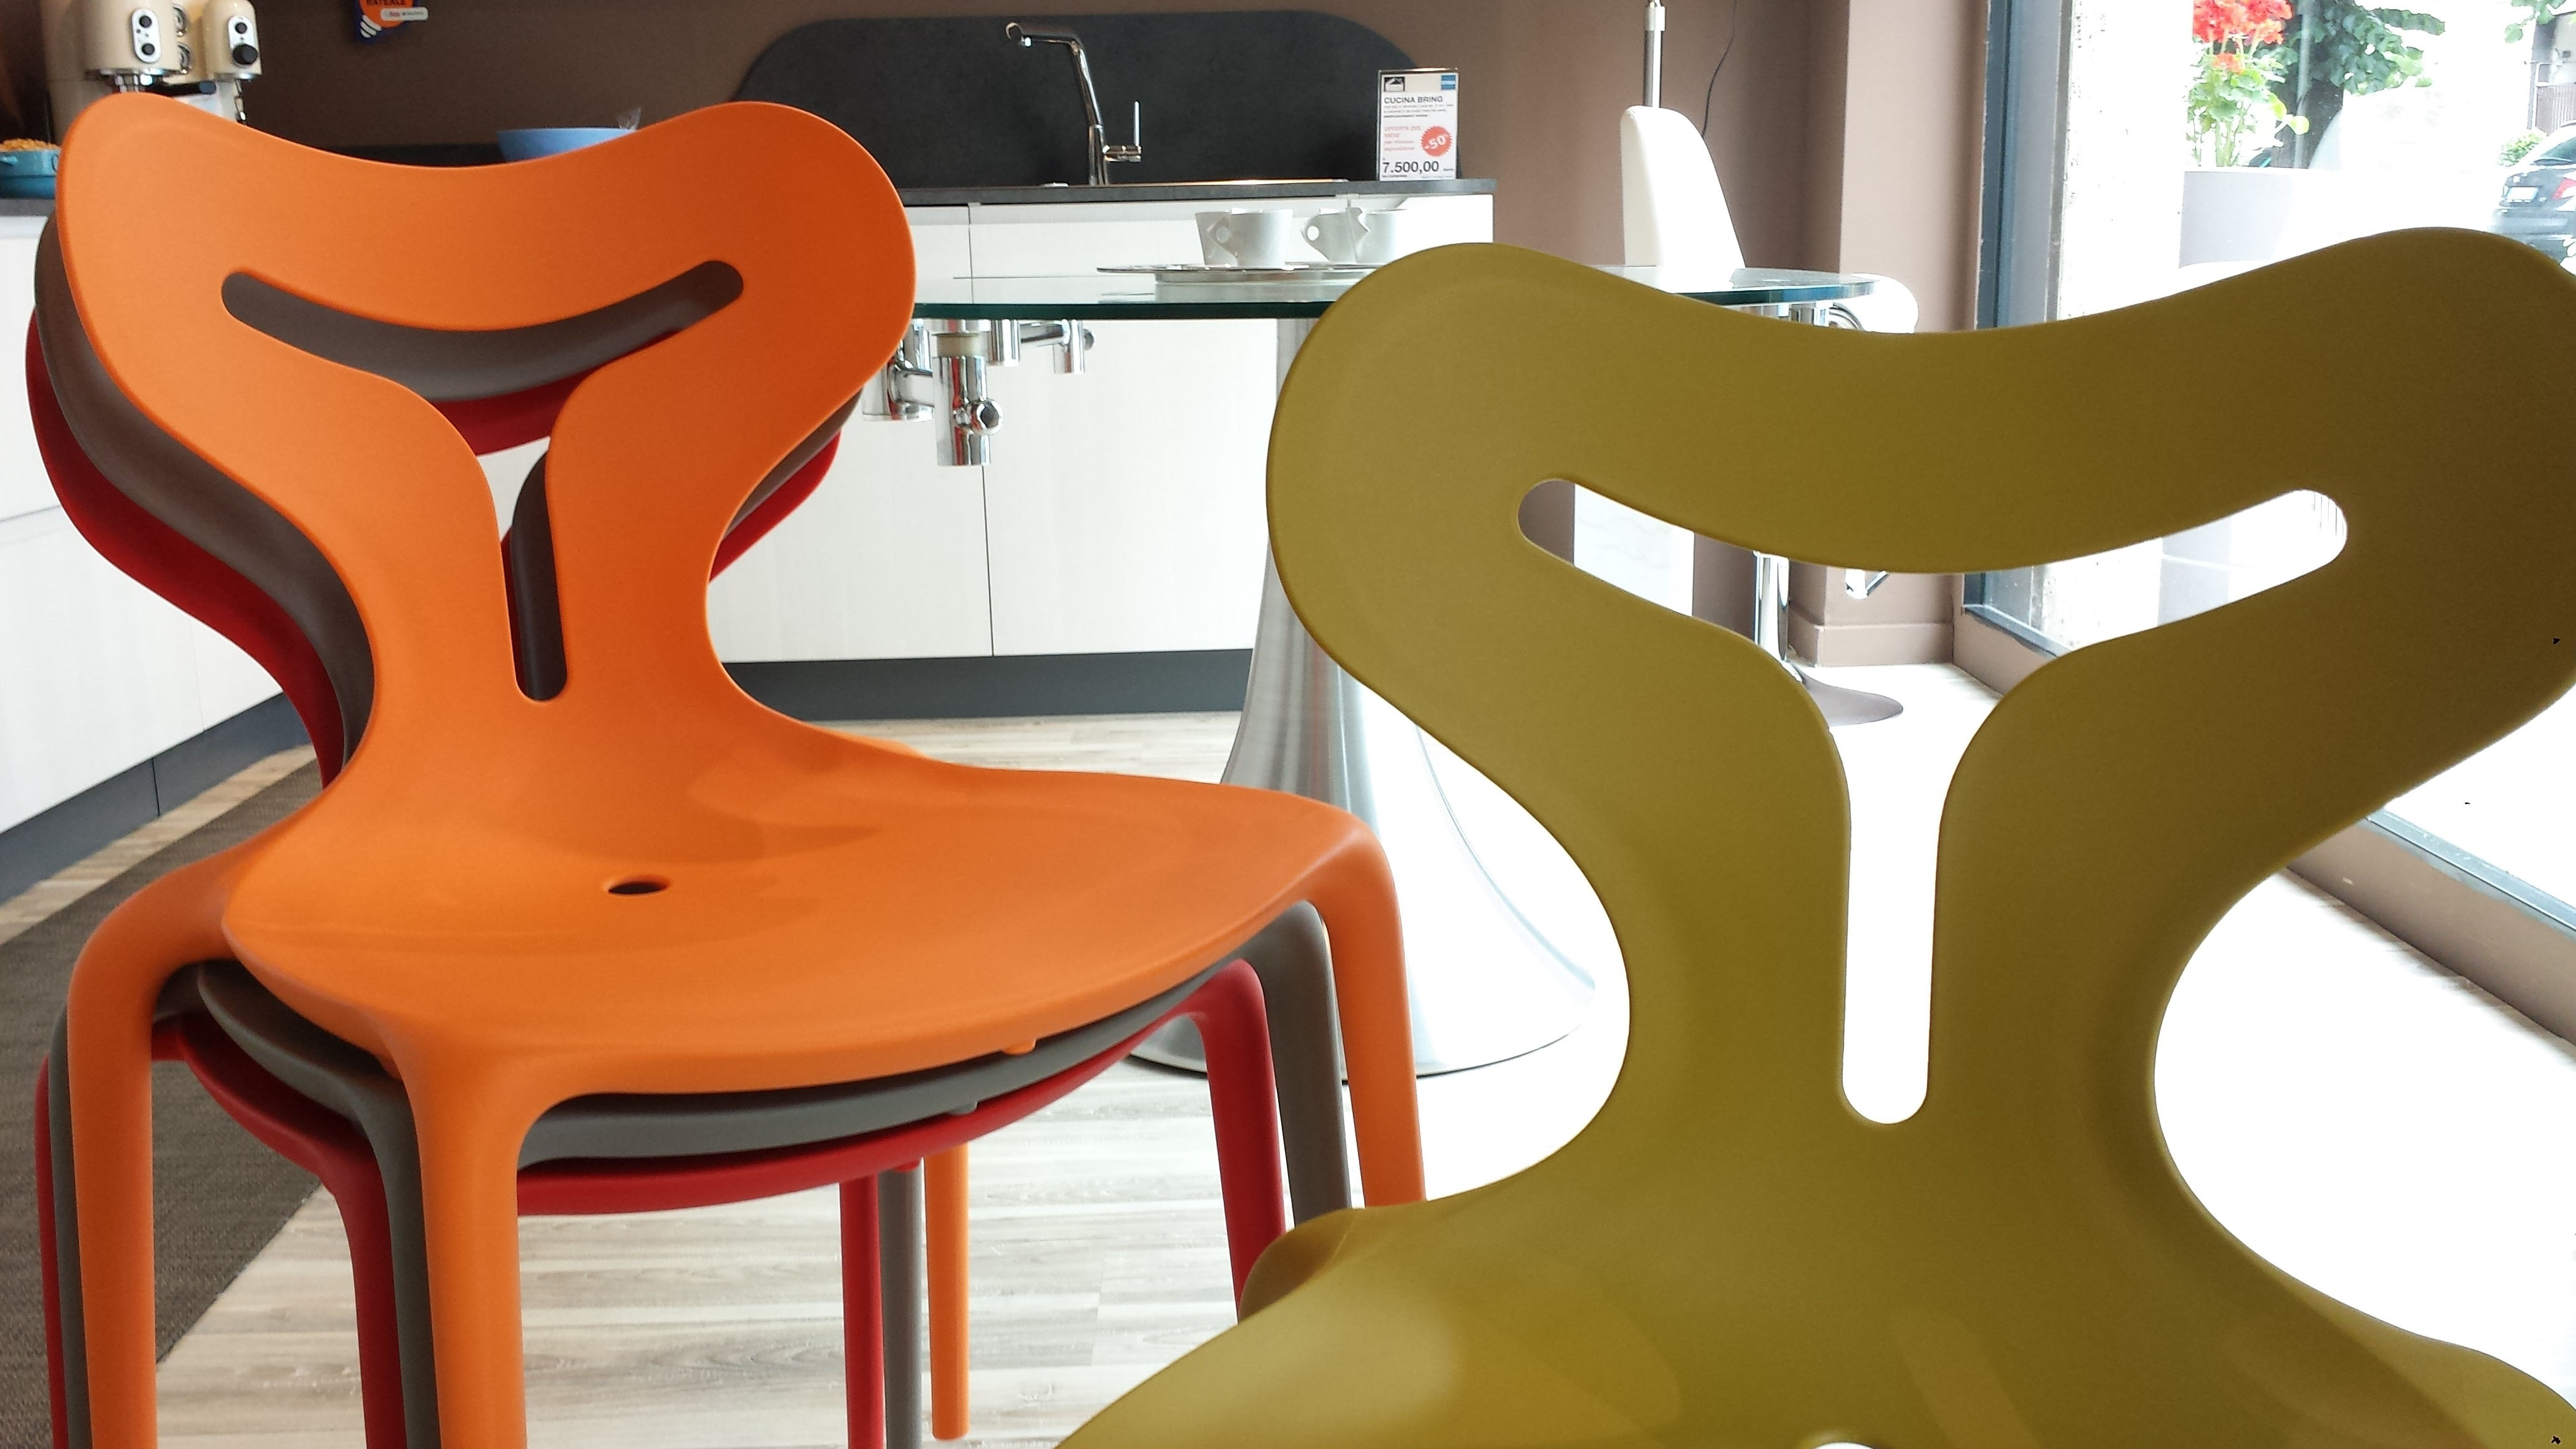 7700 trevi sconto 50 sedia in legno elegante. sedie da cucina in ...